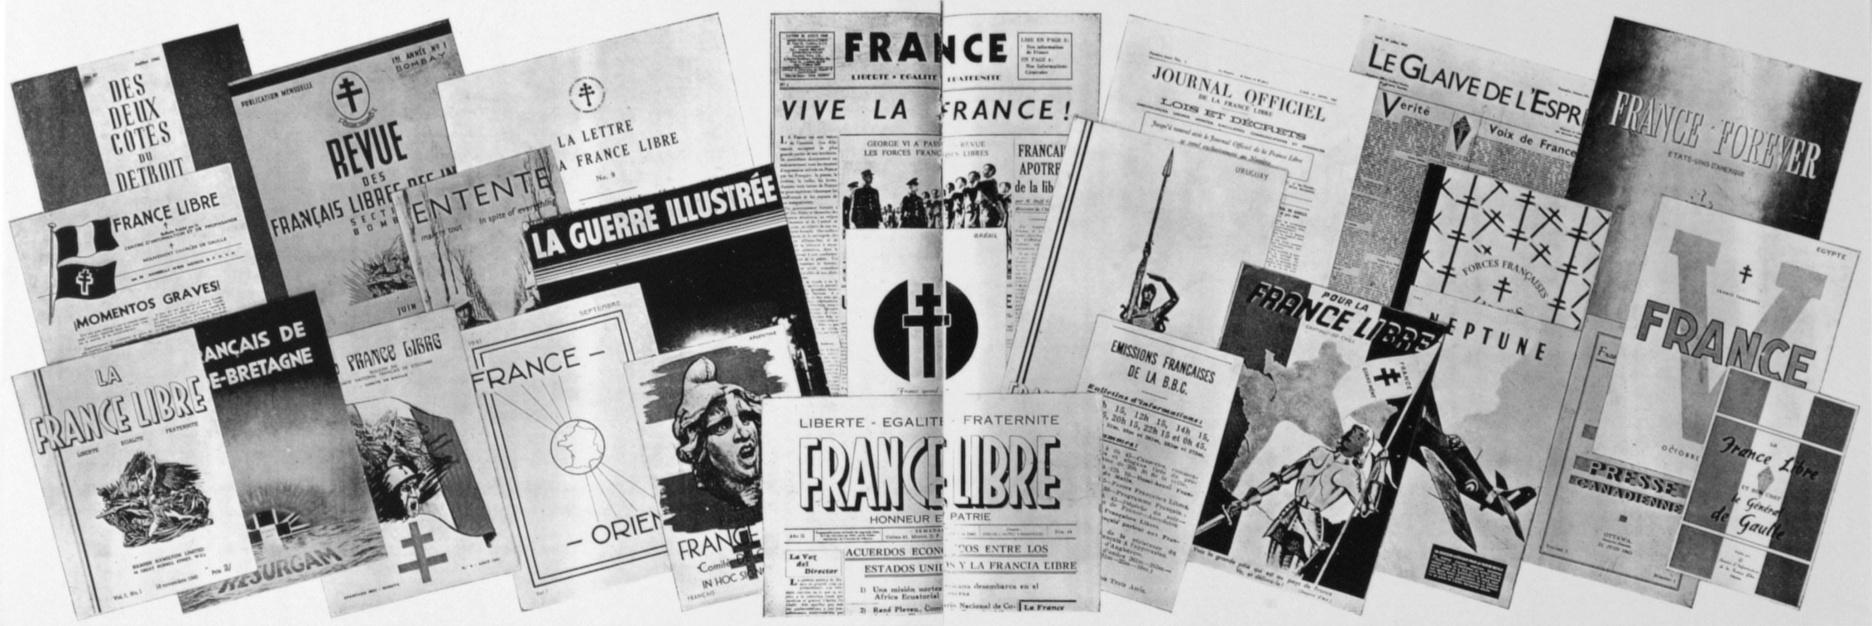 Panorama de la presse de la France Libre